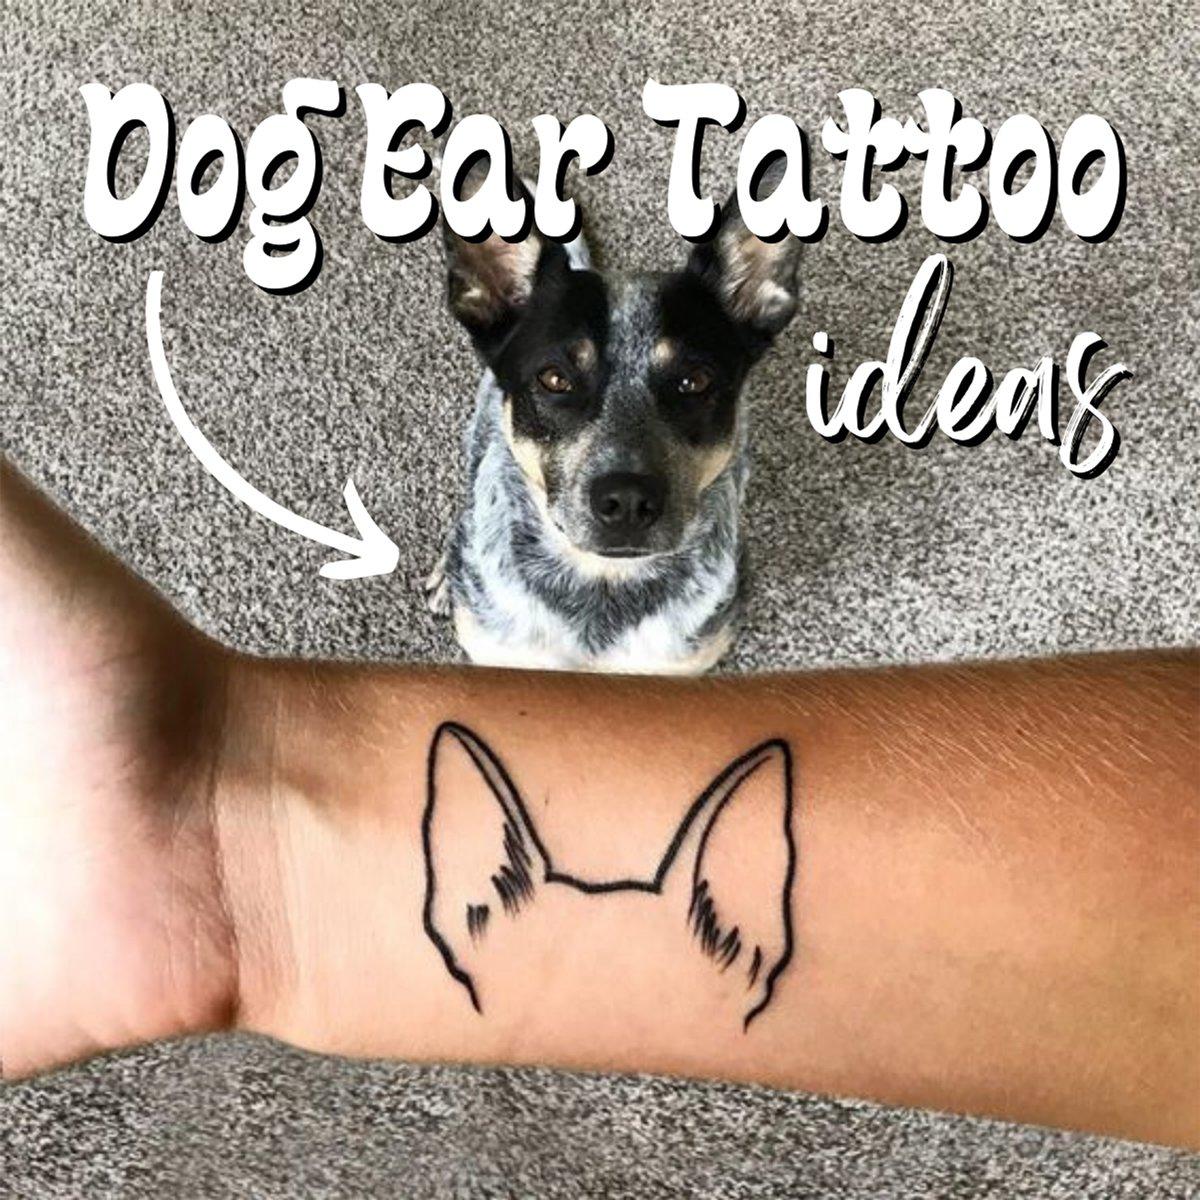 Dog Ear Tattoo